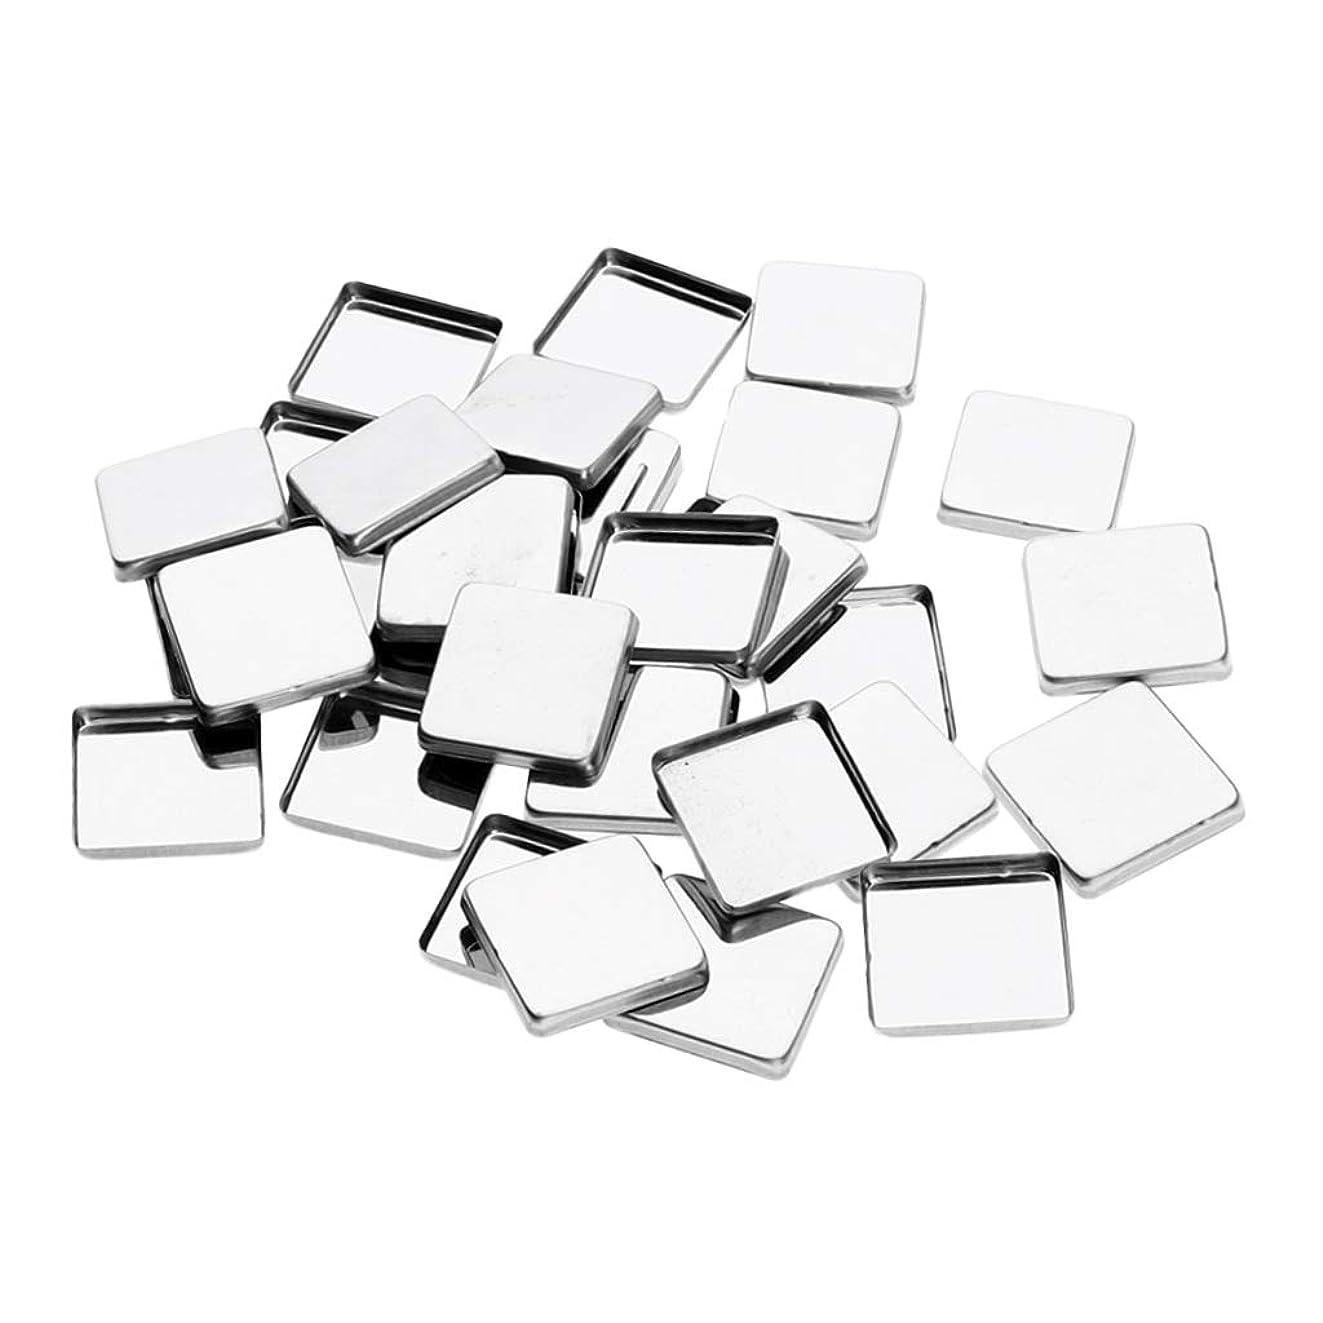 Perfeclan メイクアップパン アイシャドーパレット 化粧パレット 全2サイズ - S